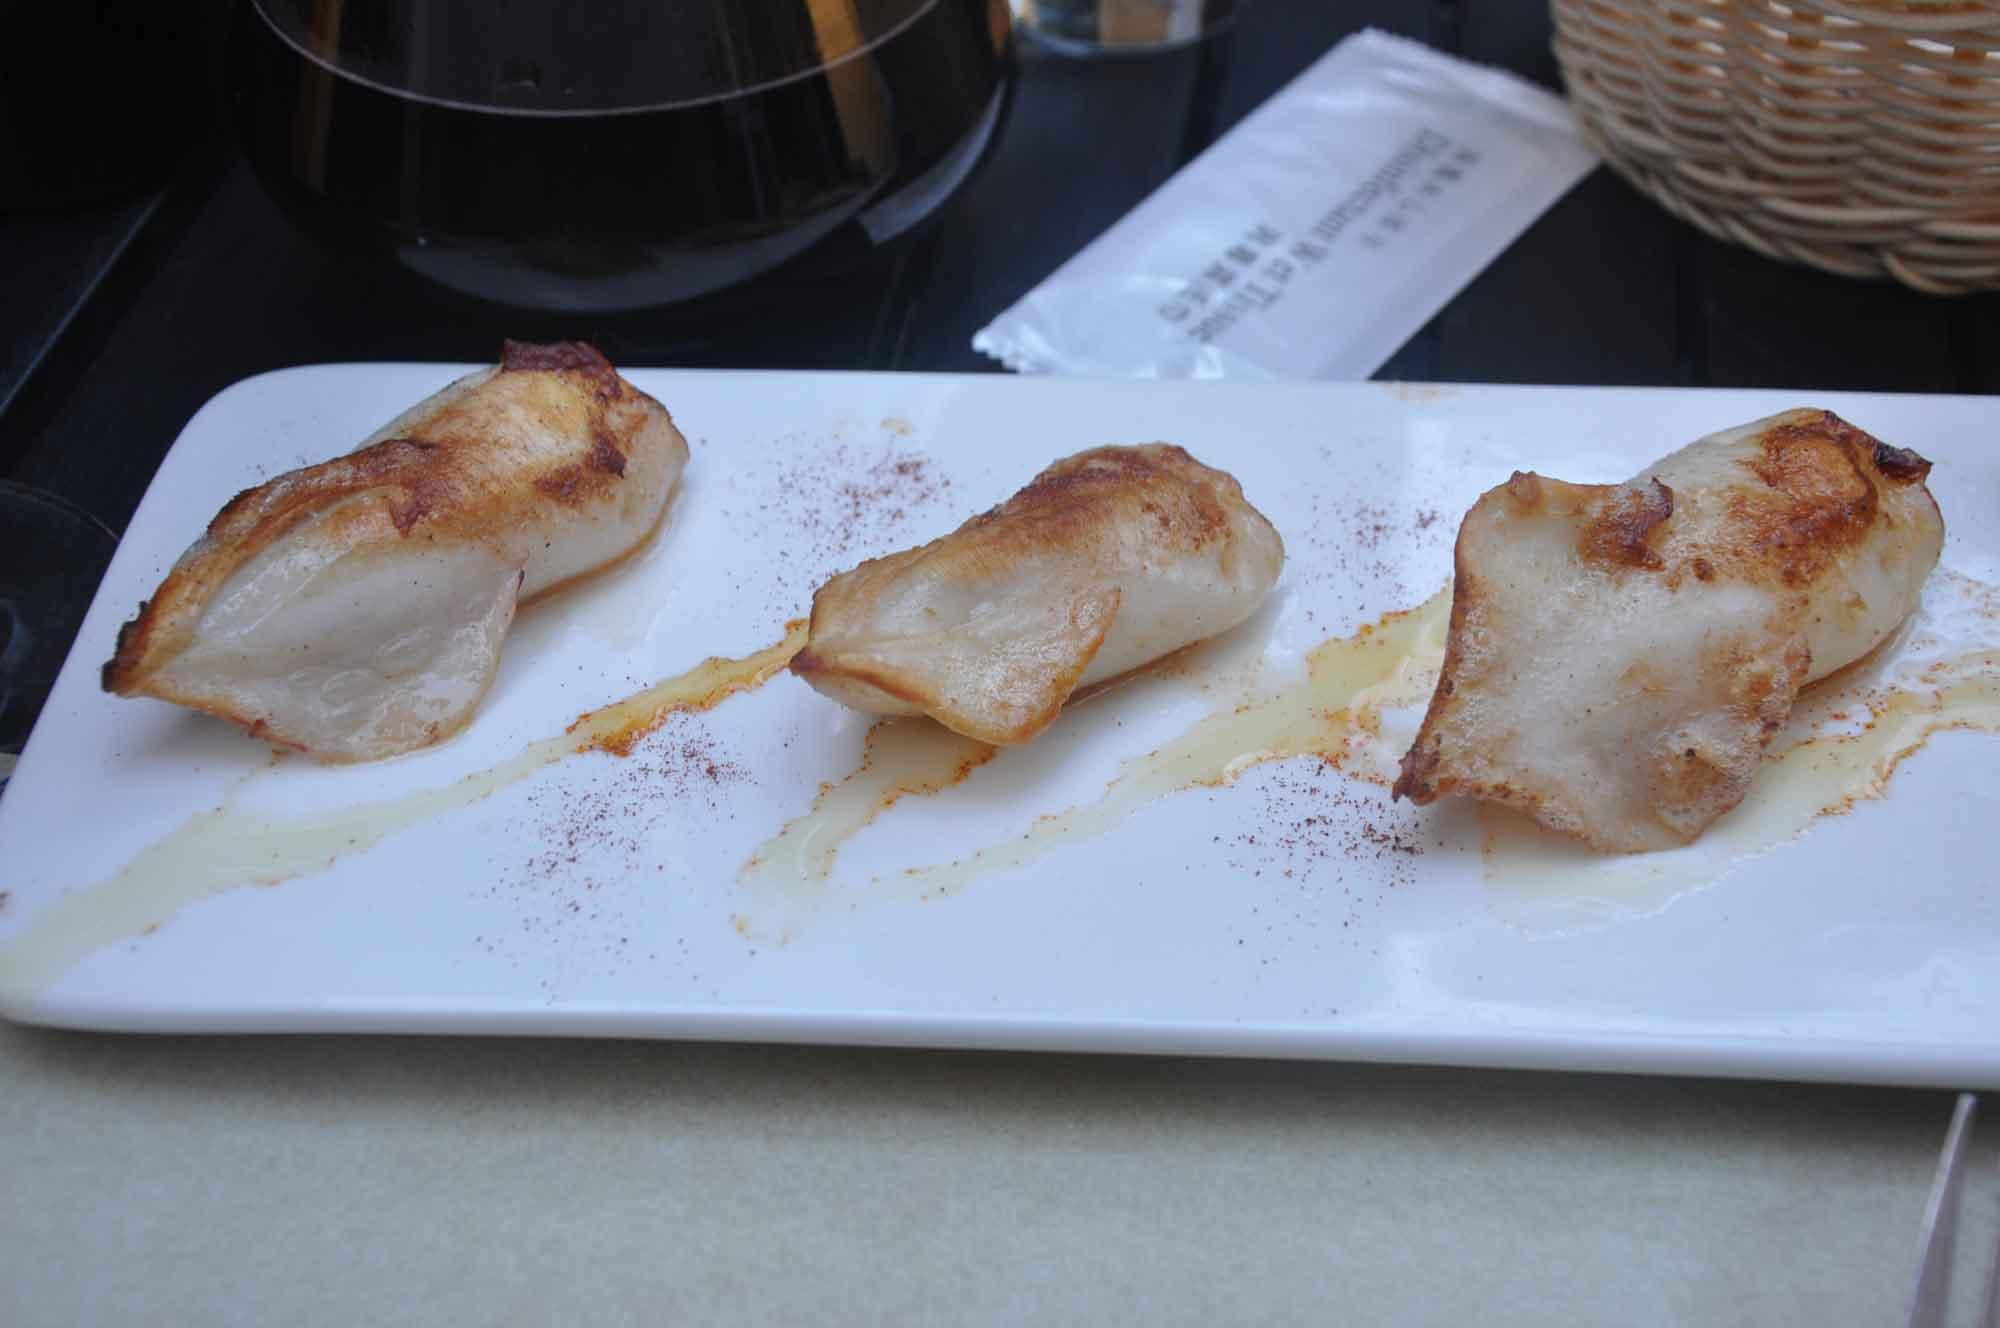 Albergue 1601 stuffed squid